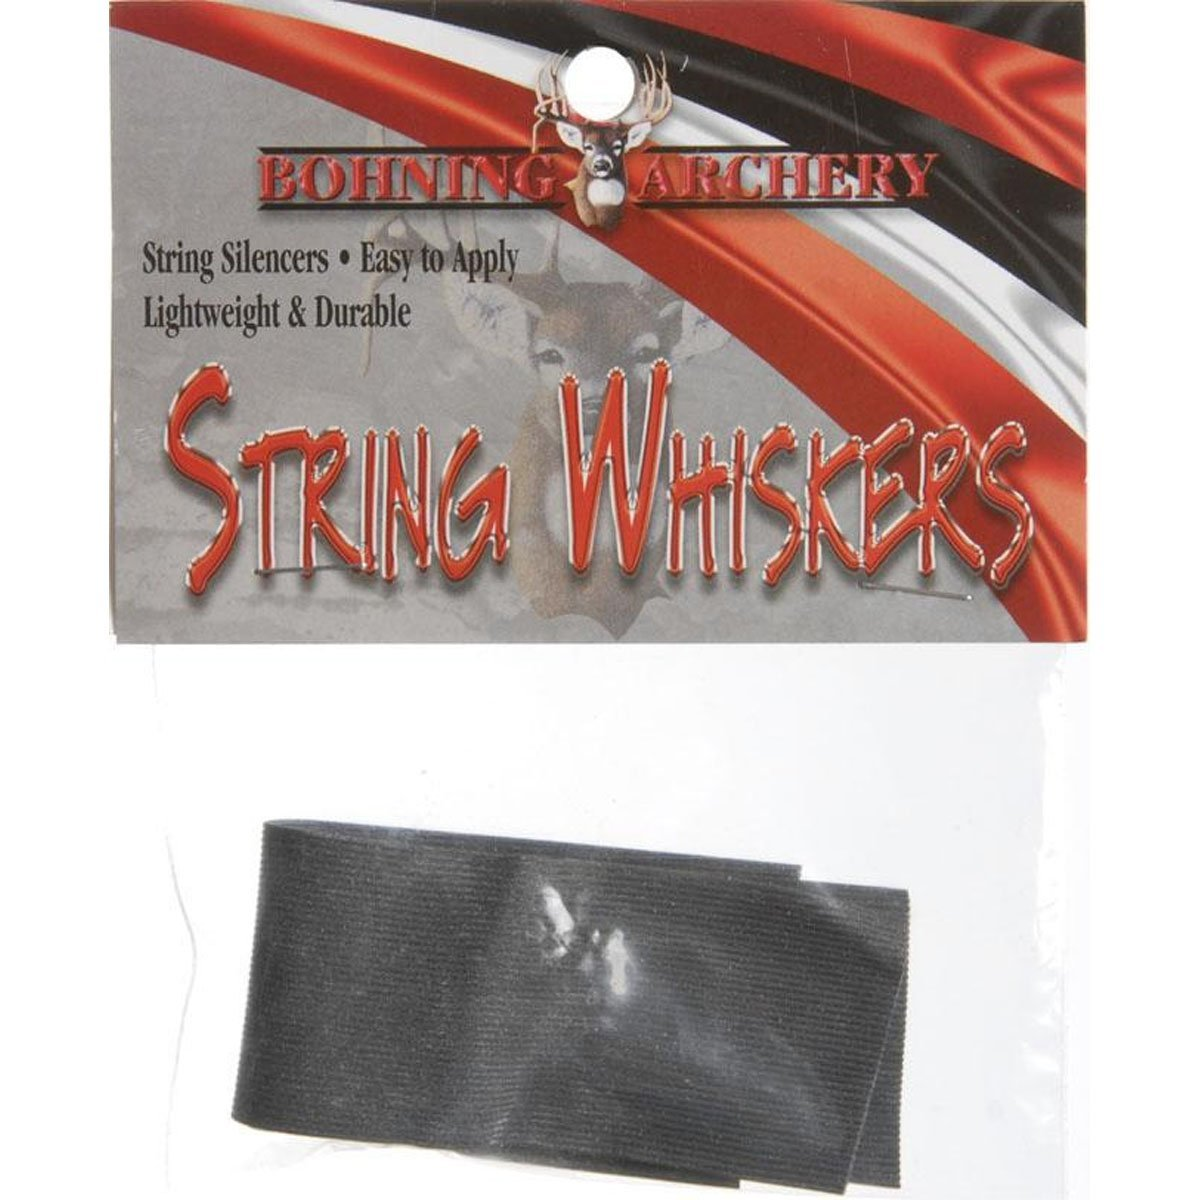 Bohning String Whiskers, ,